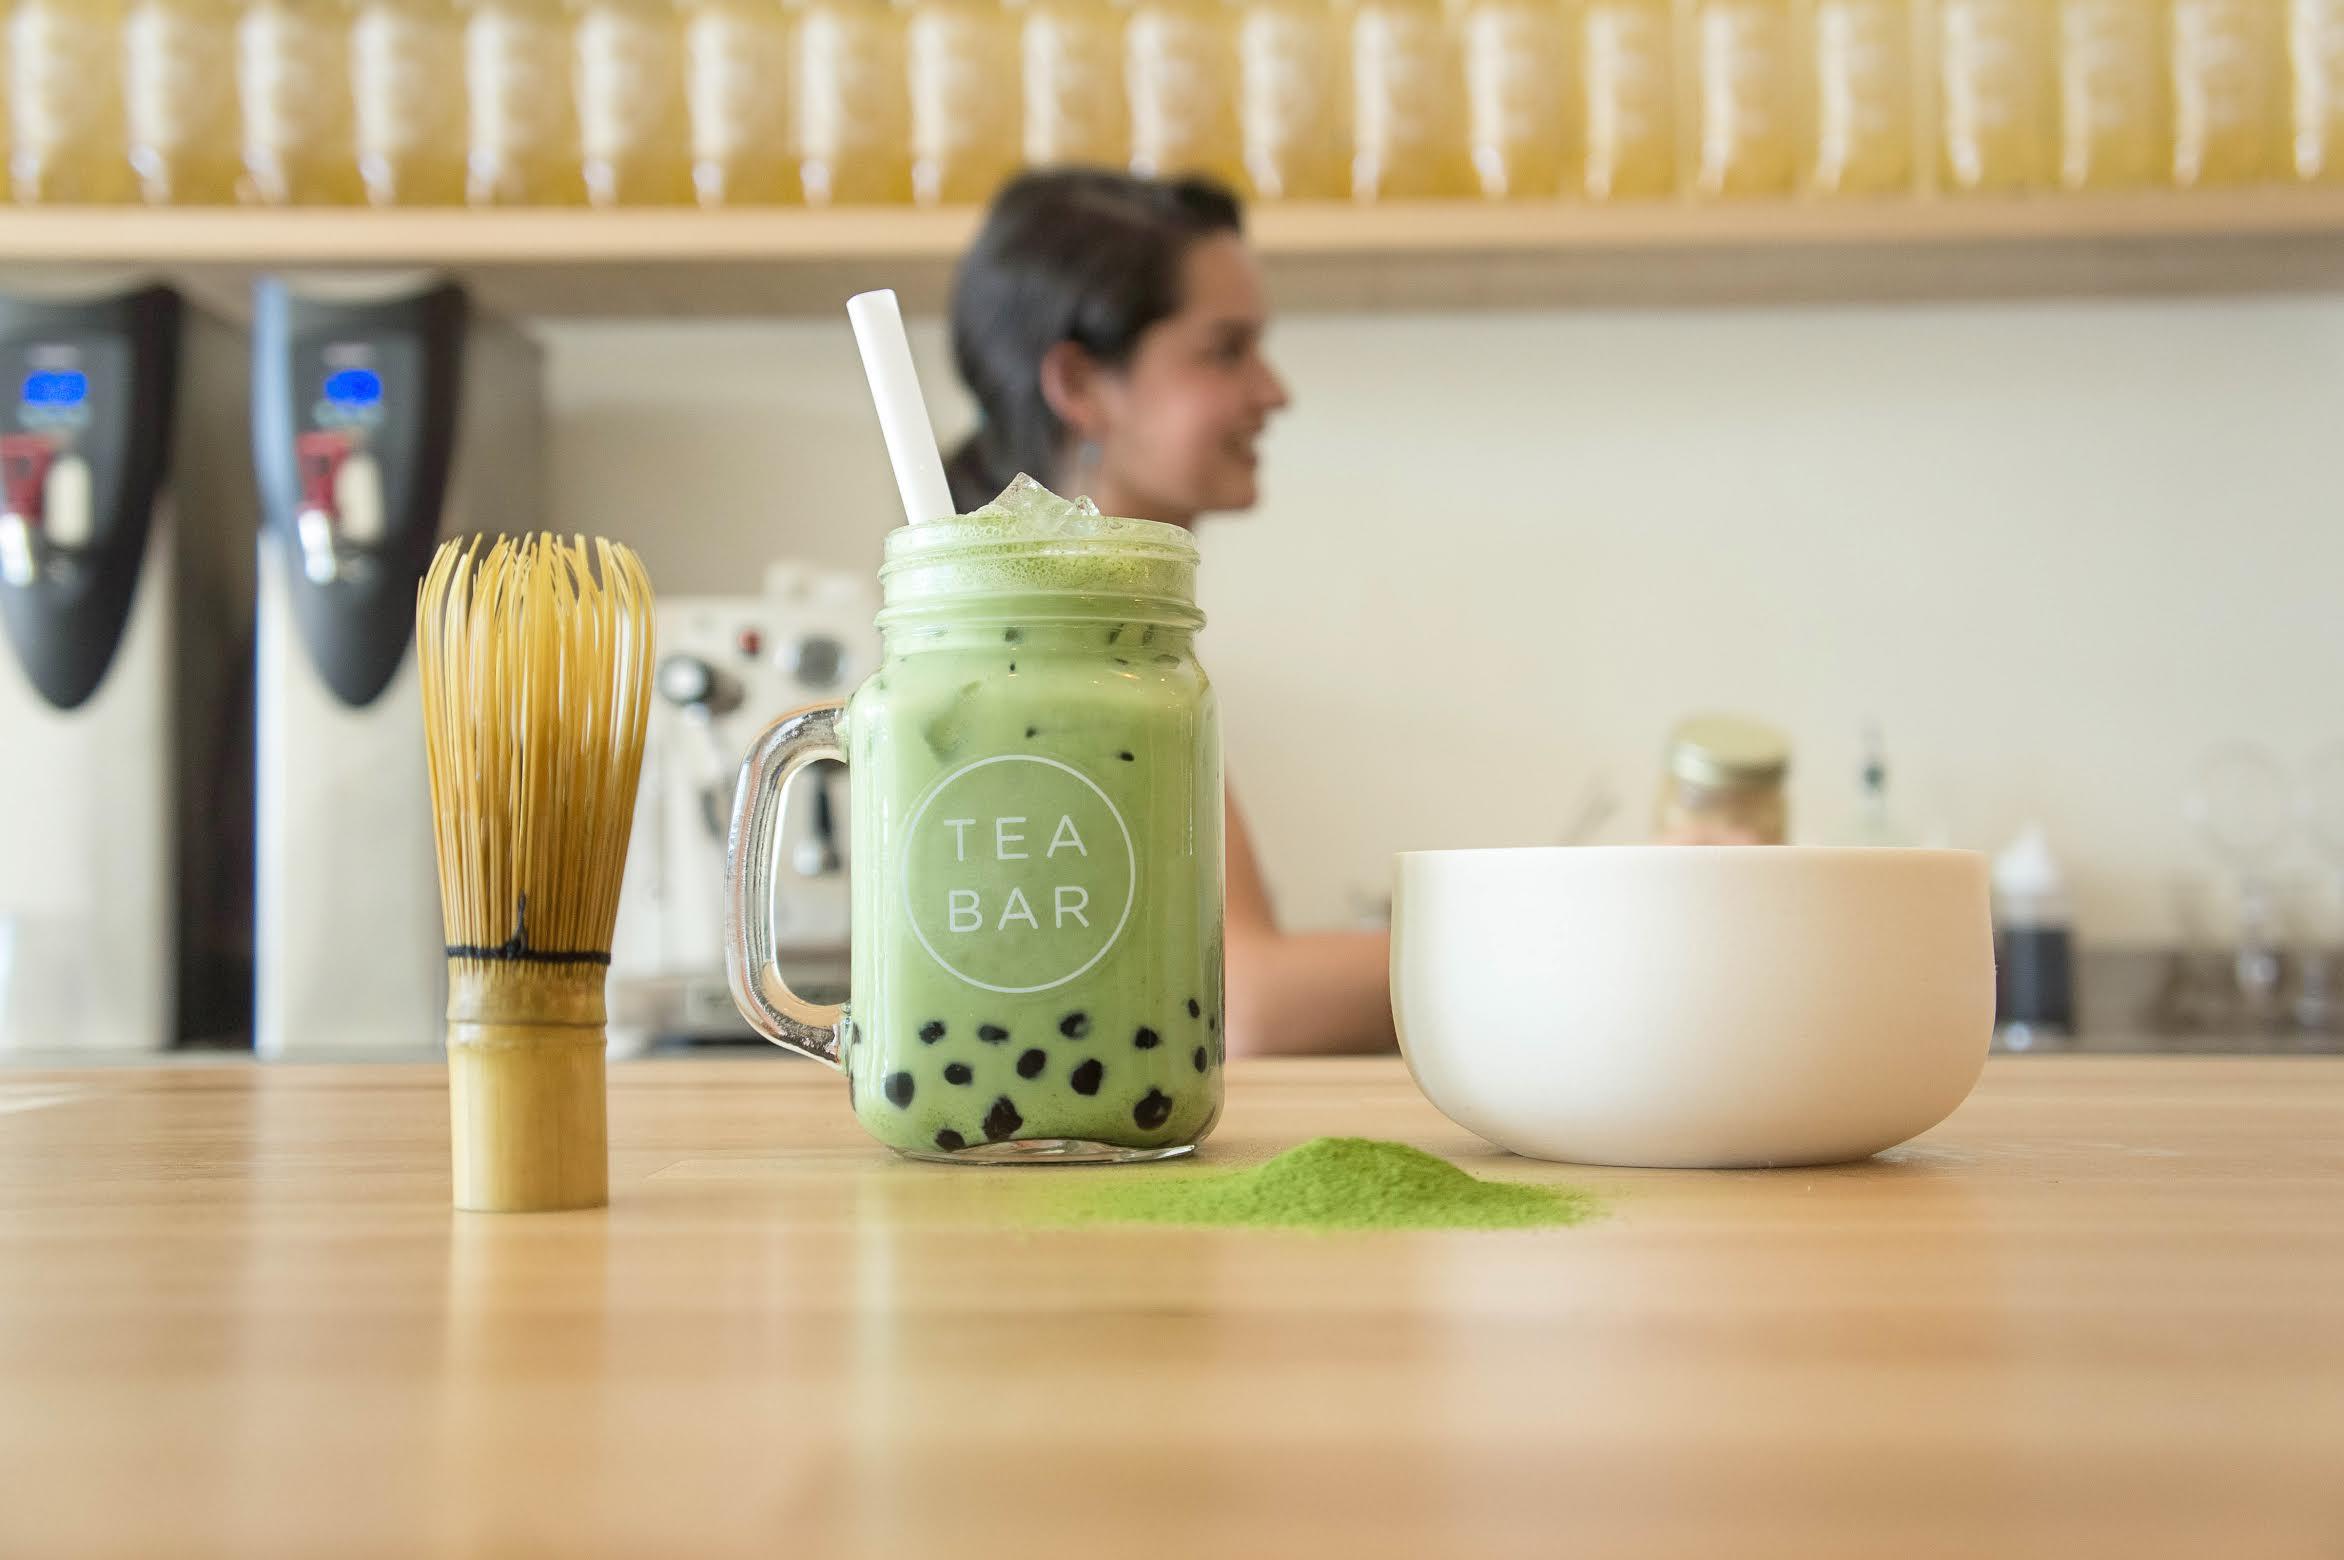 A glass of mint green bubble tea in a glass jar